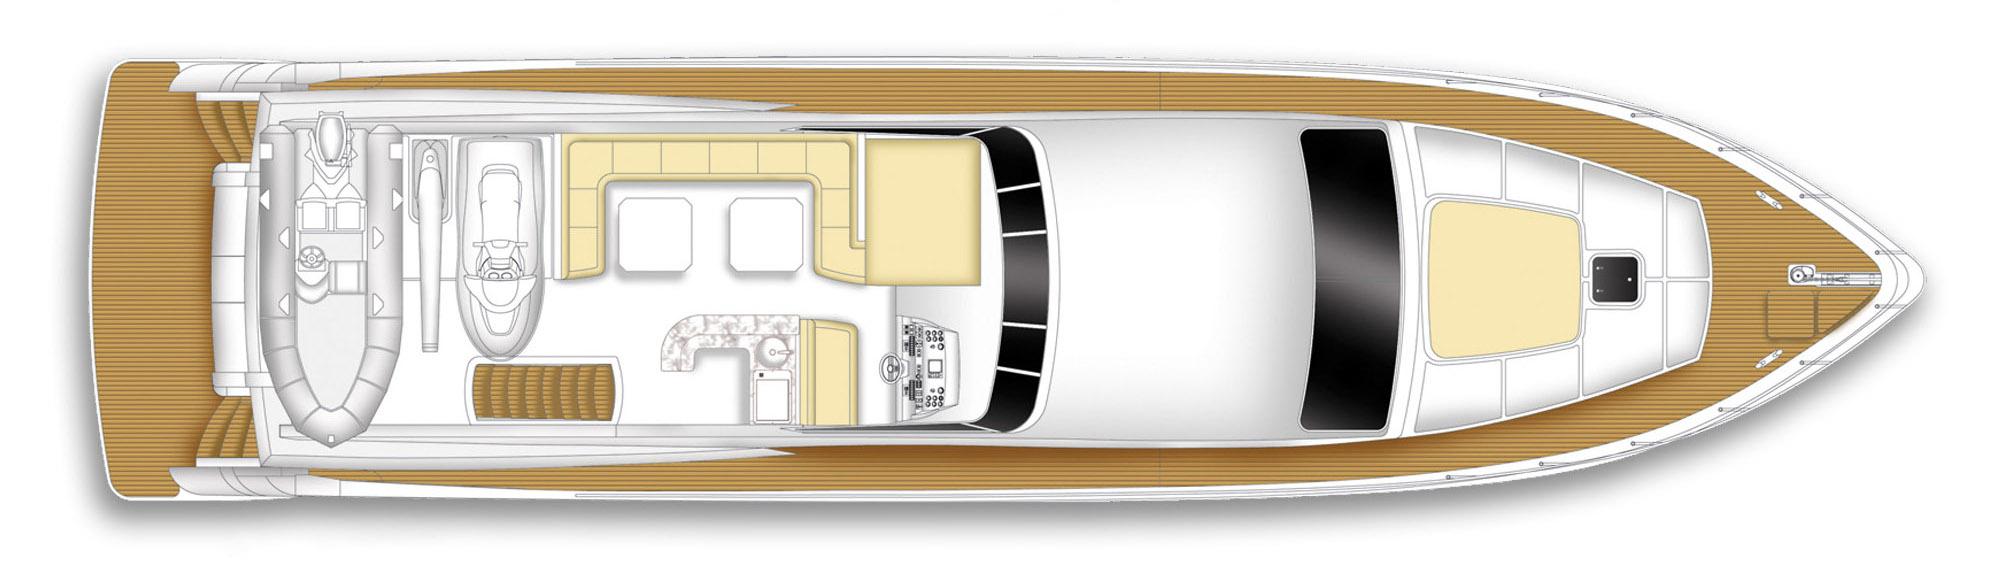 deckplans1-1